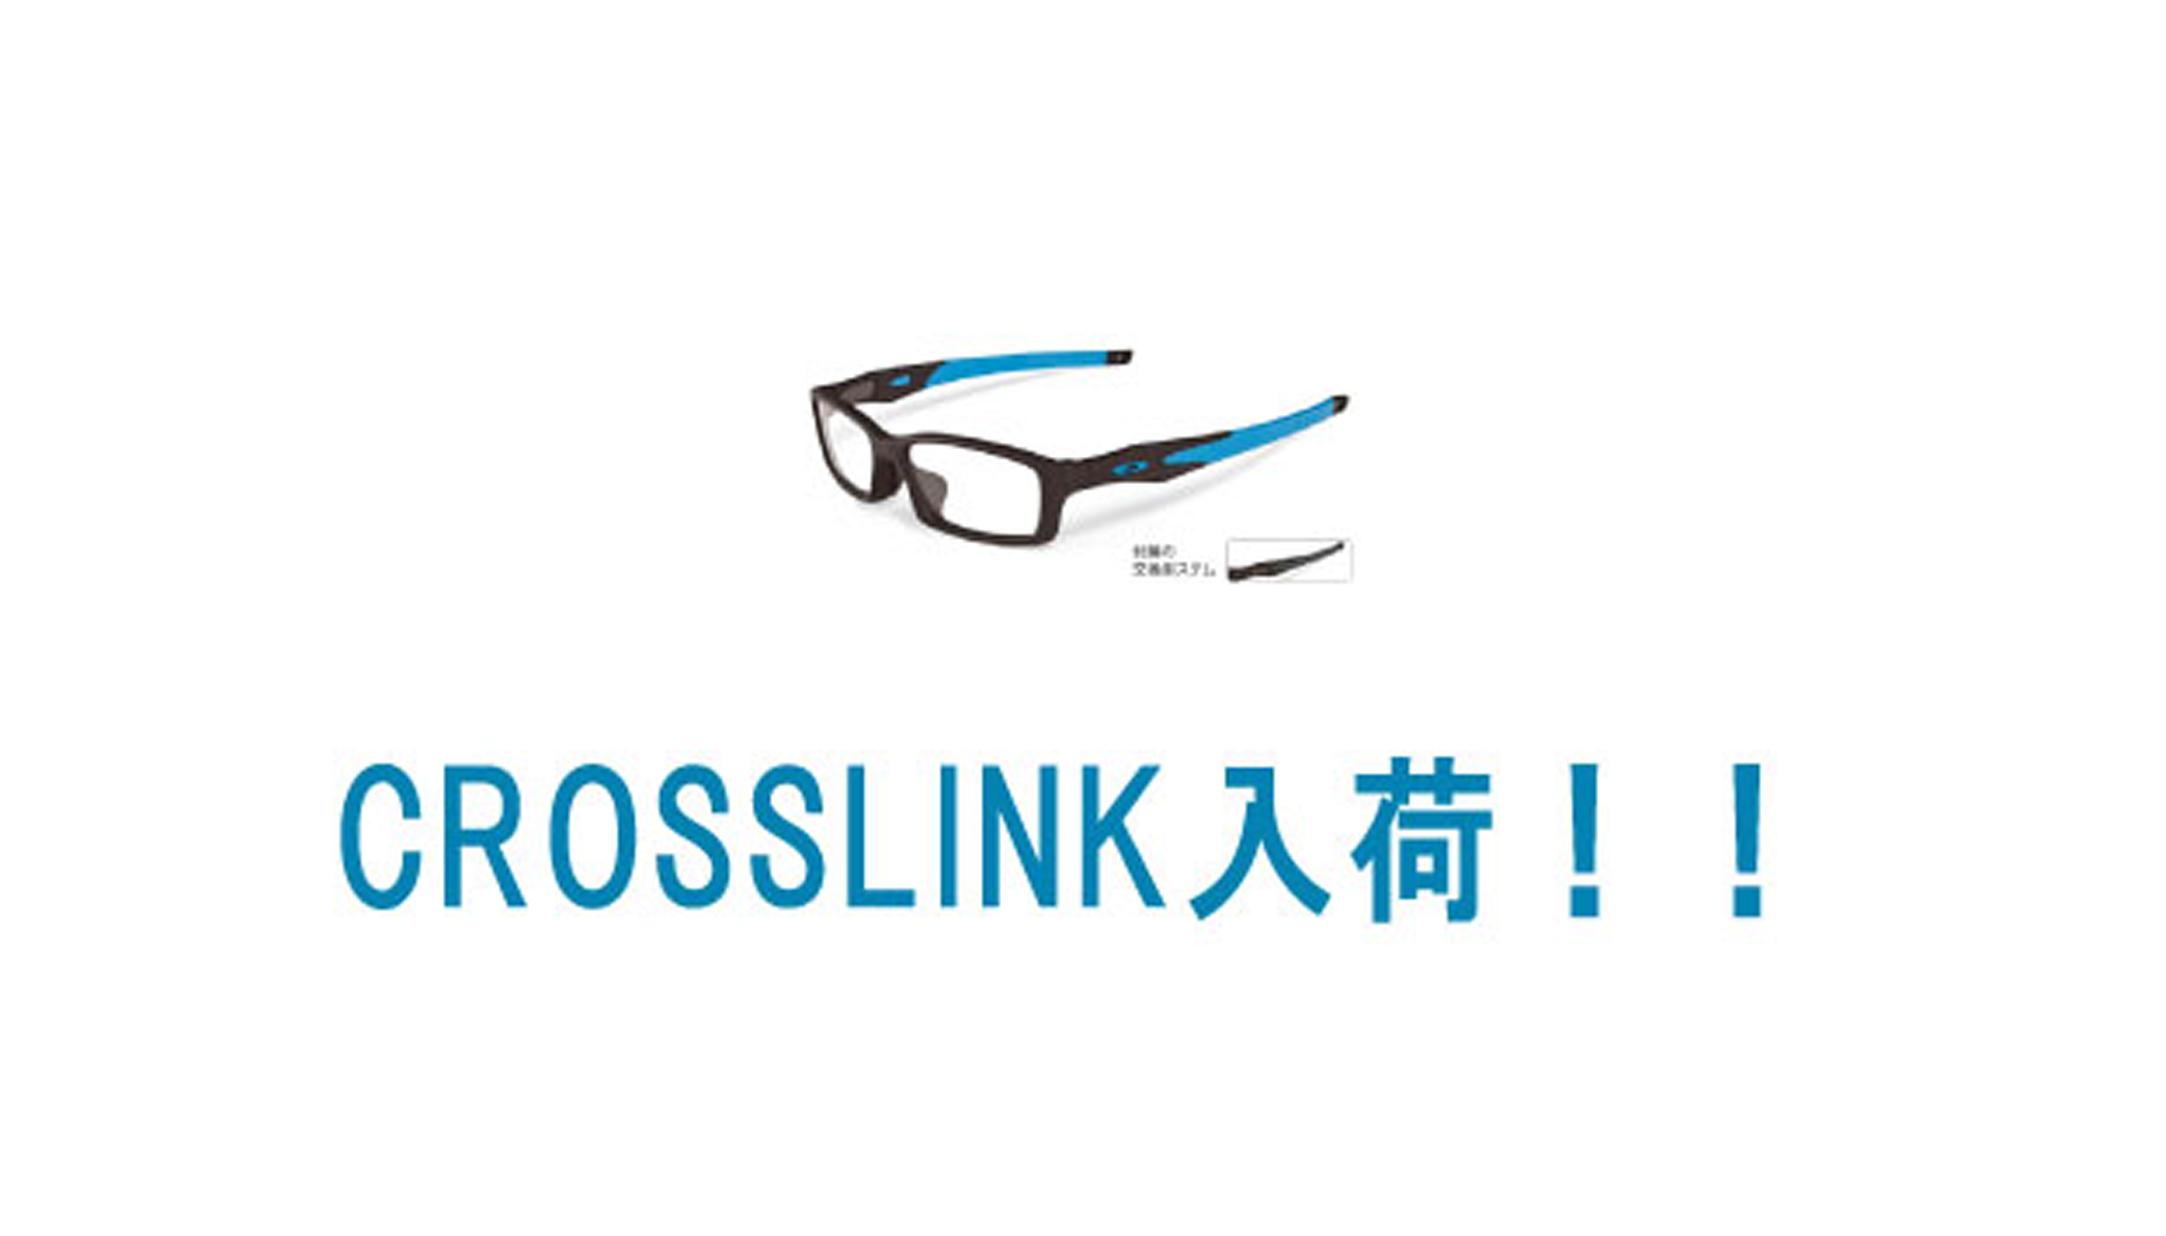 CROSSLINK(クロスリンク)入荷!